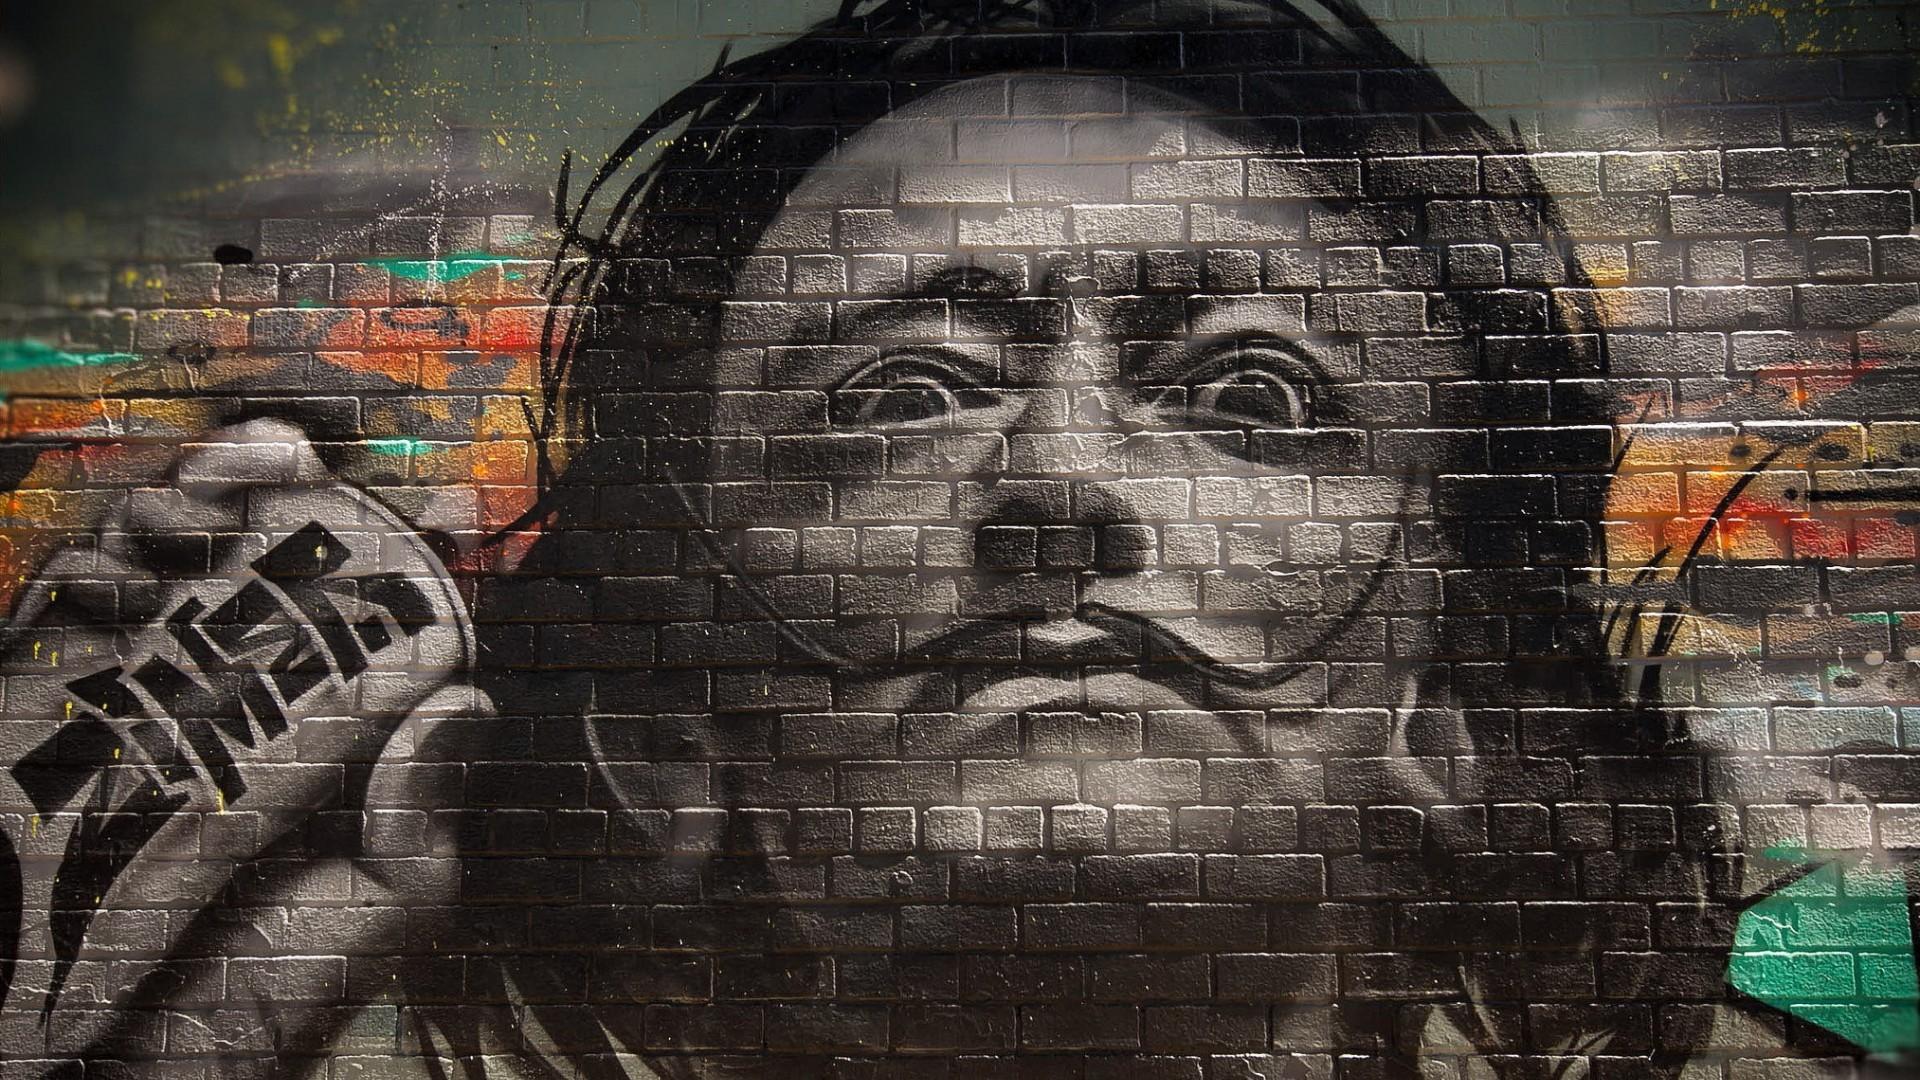 graffiti_of_salvador_dali